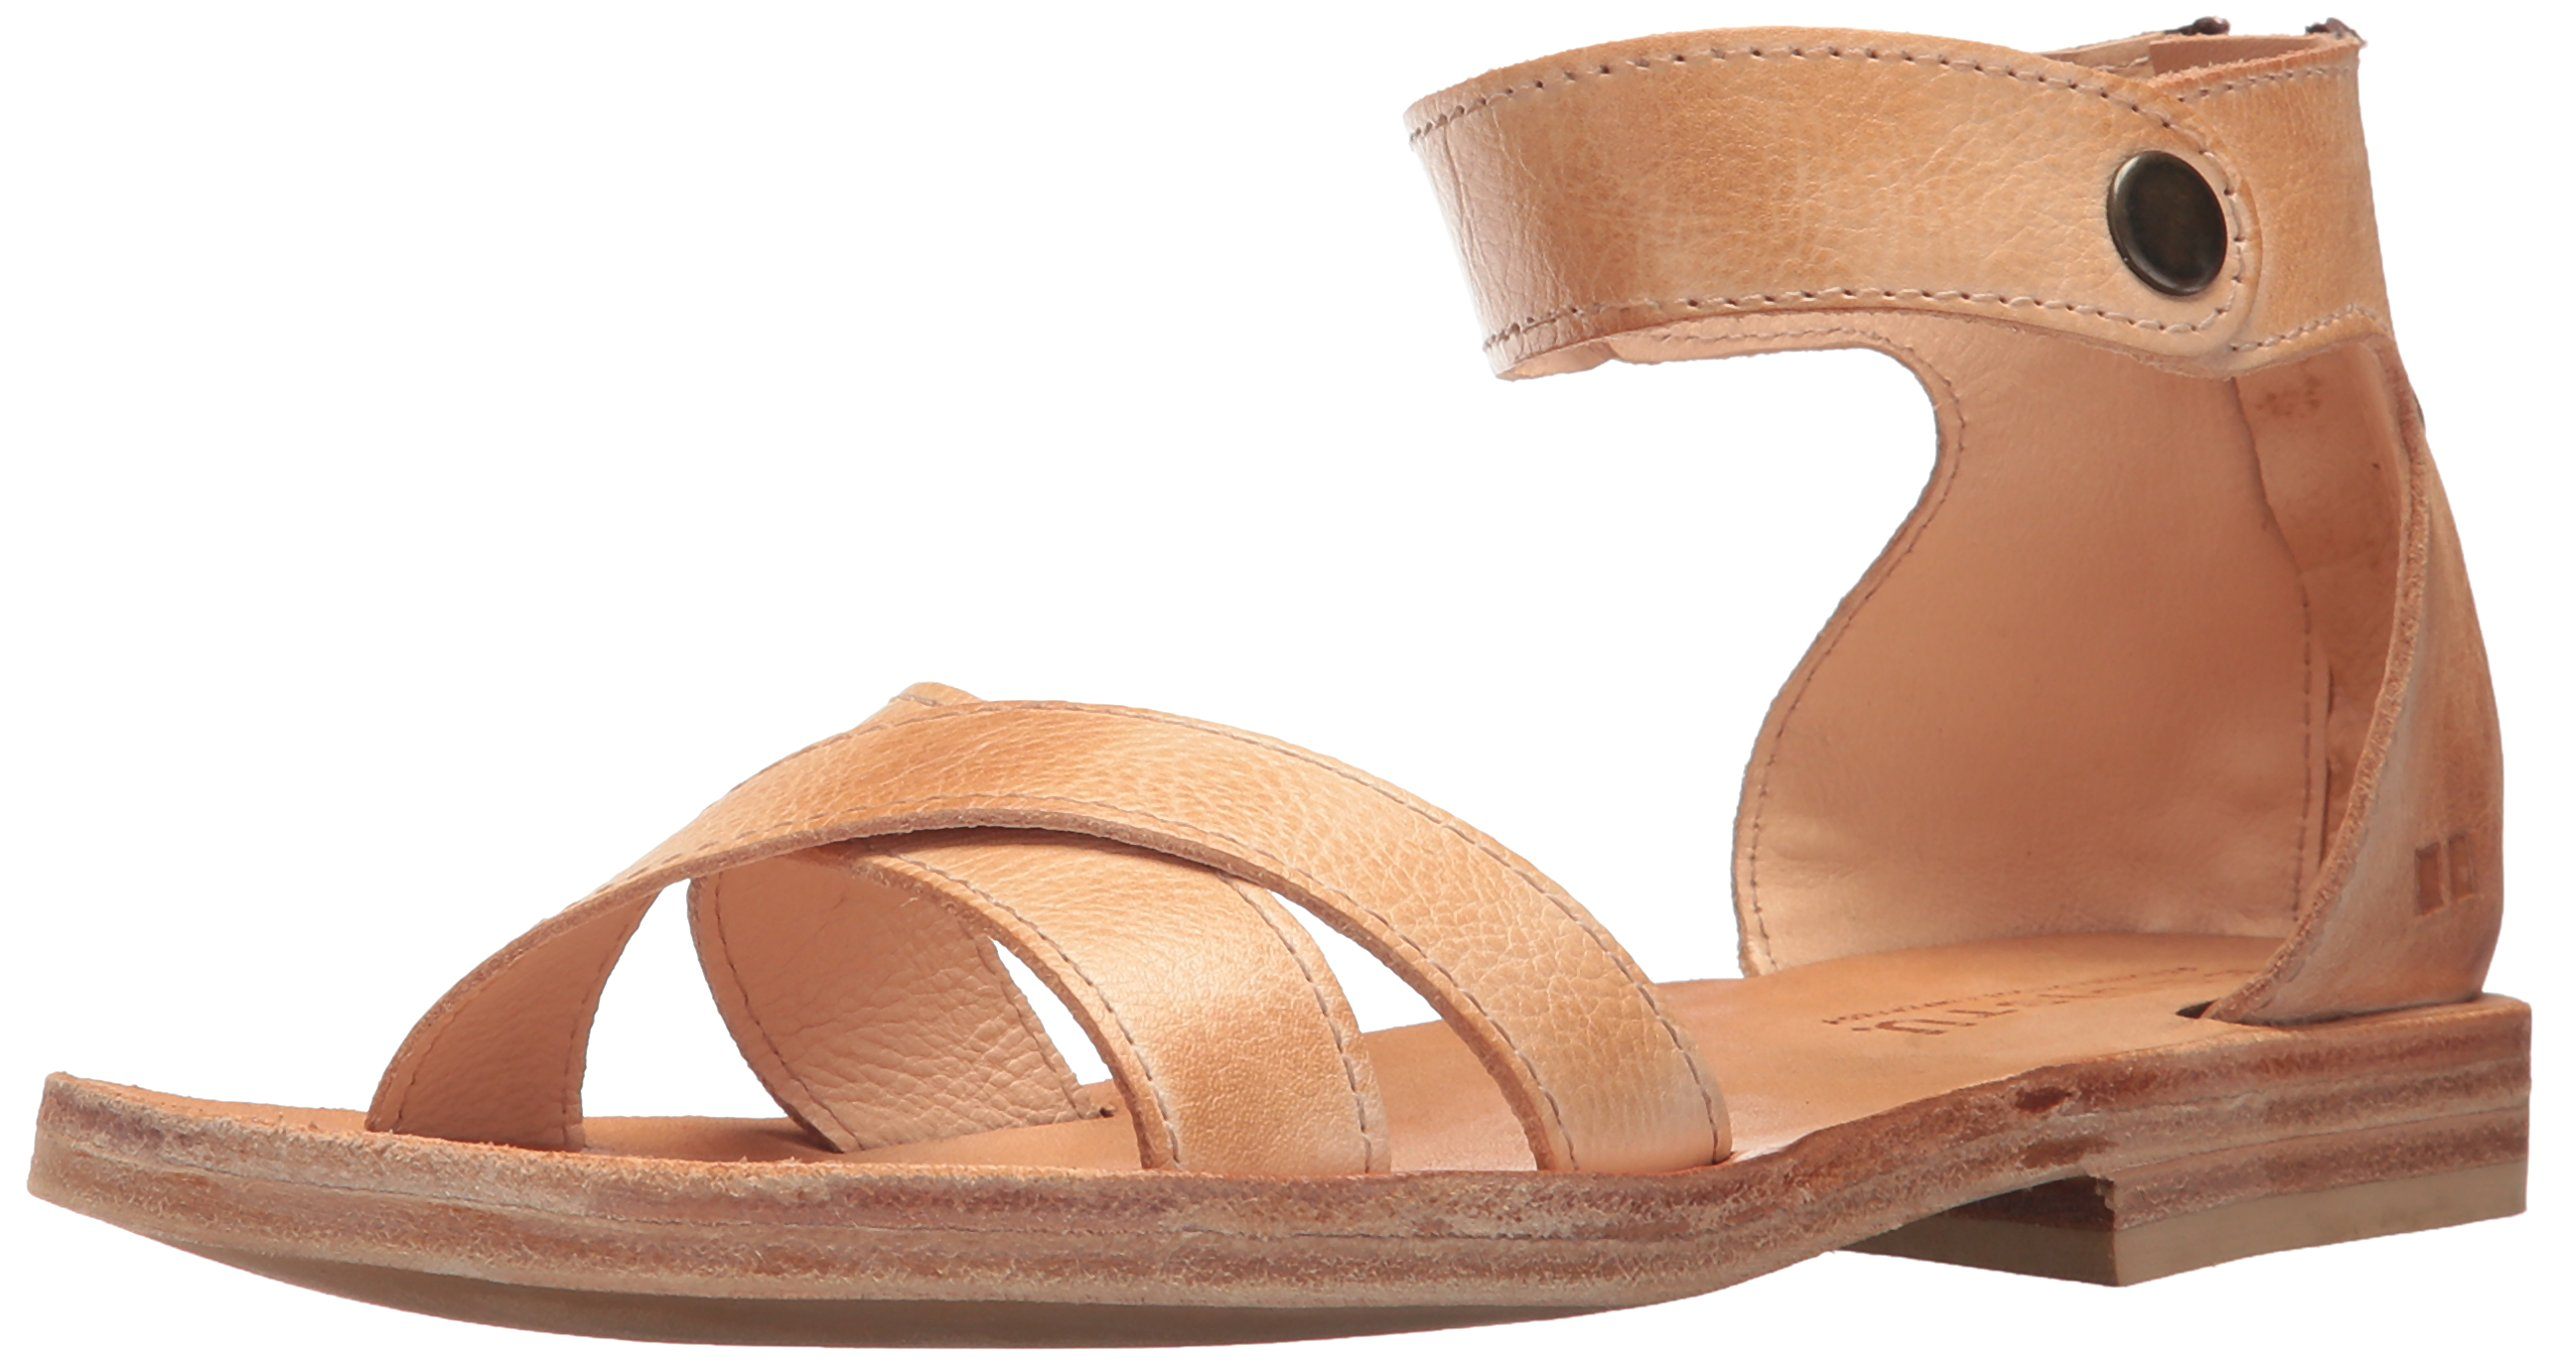 Bed|Stu Women's Tulli Flat Sandal, Sand Rustic, 7 M US